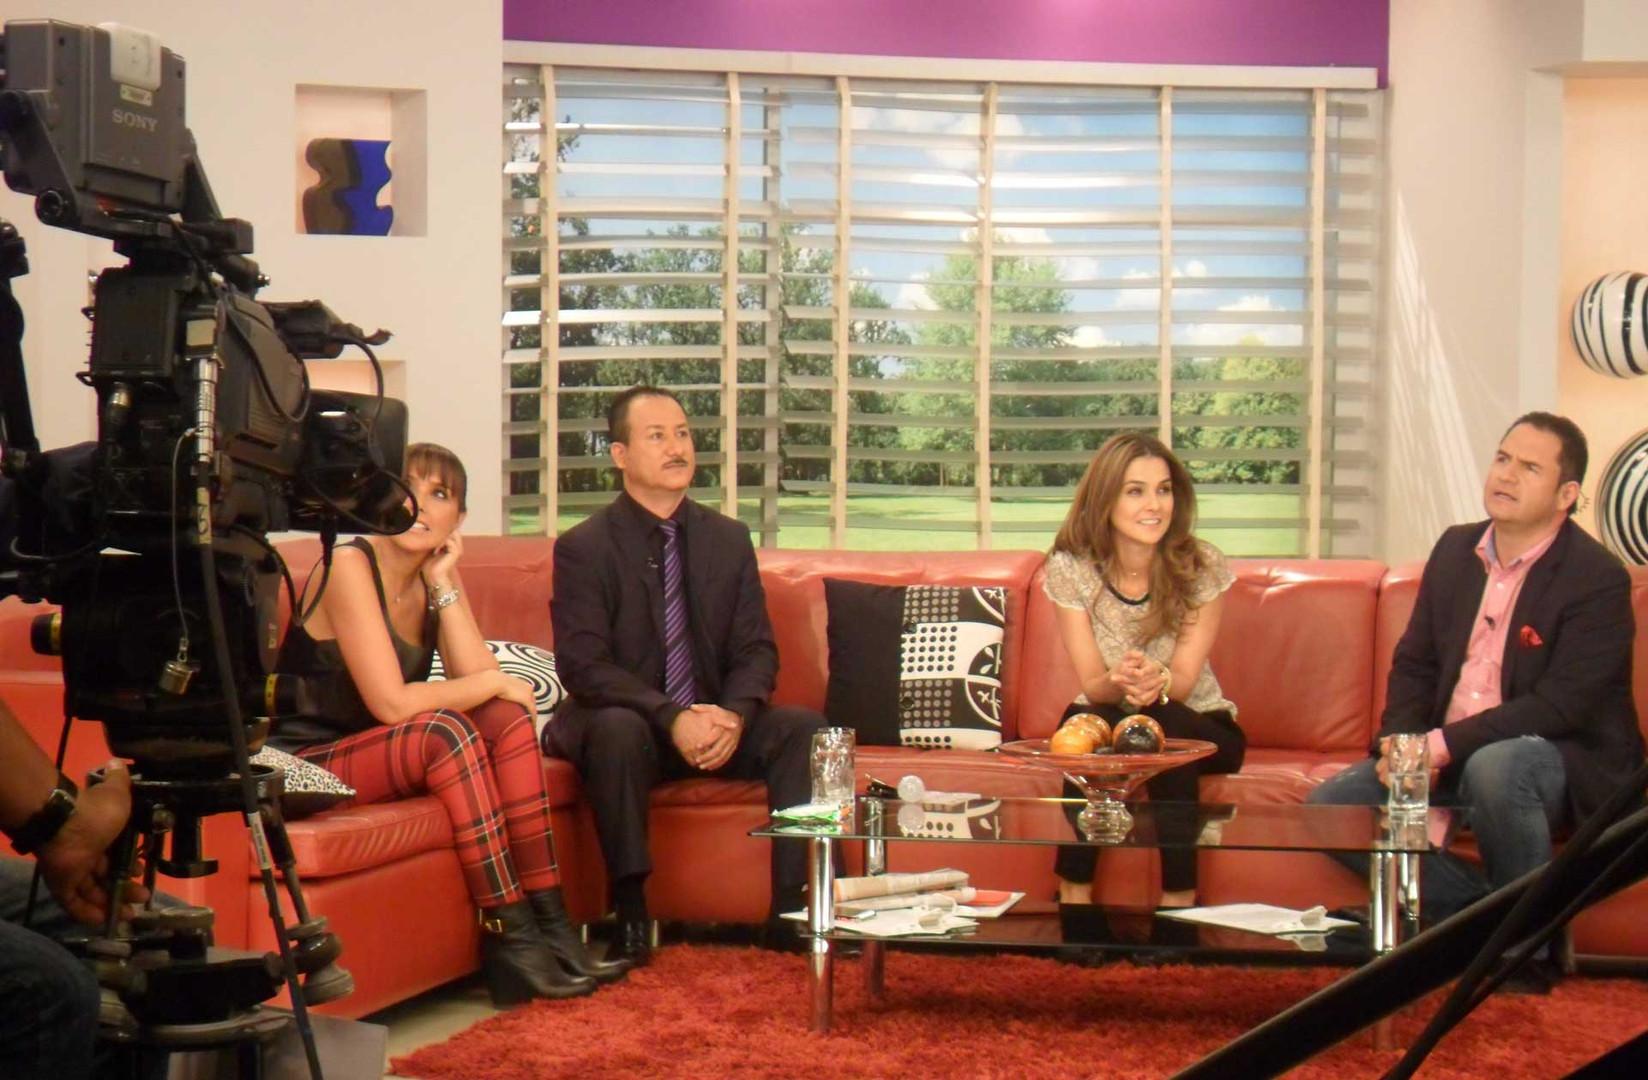 Invitado al programa Dia a Dia de Caracol television el mentalista e hipnotizador Richard Taylor